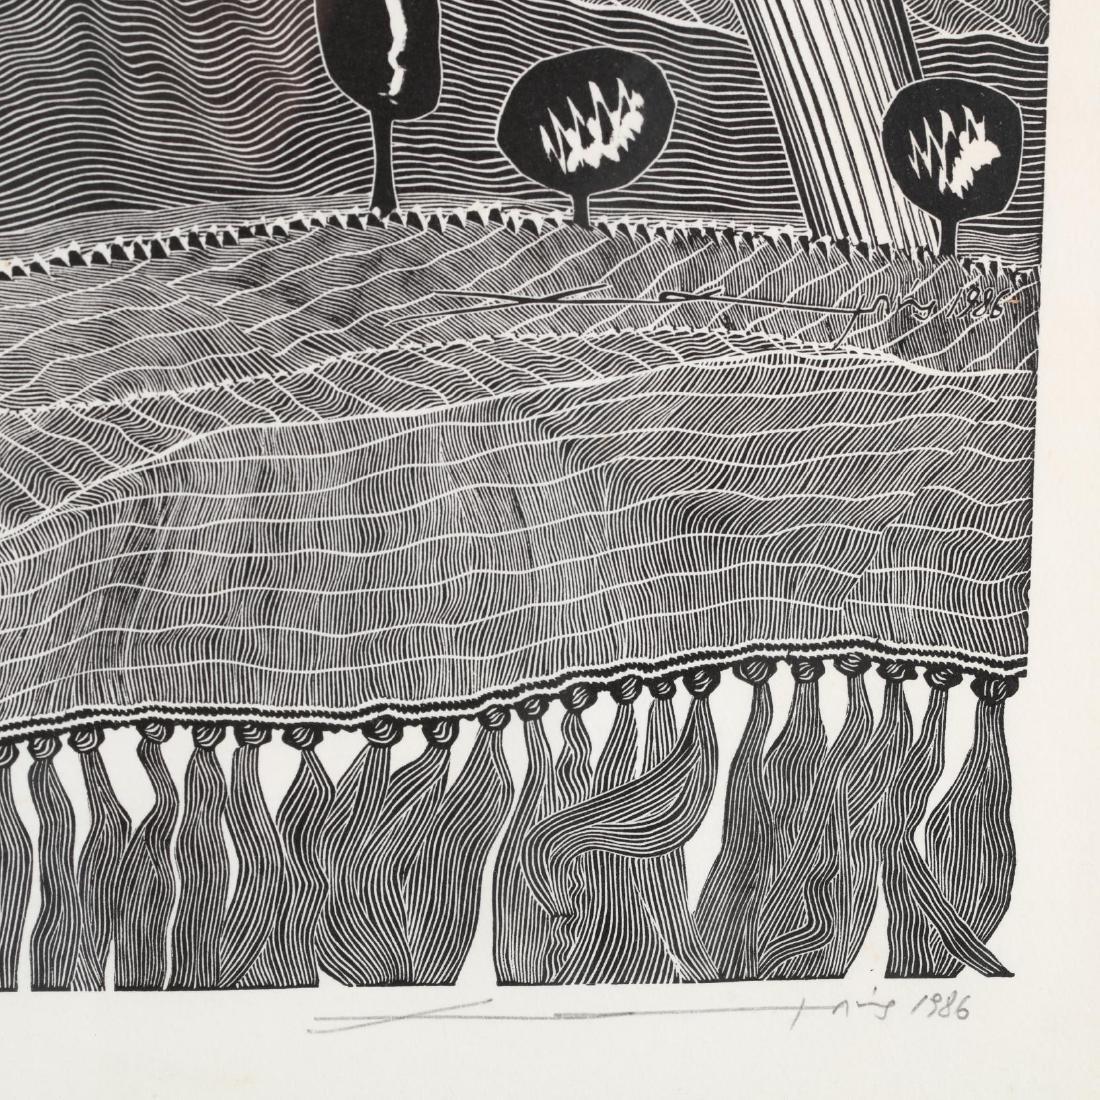 Hambis Tsangaris (Cypriot, b. 1947), Two Visions of - 3